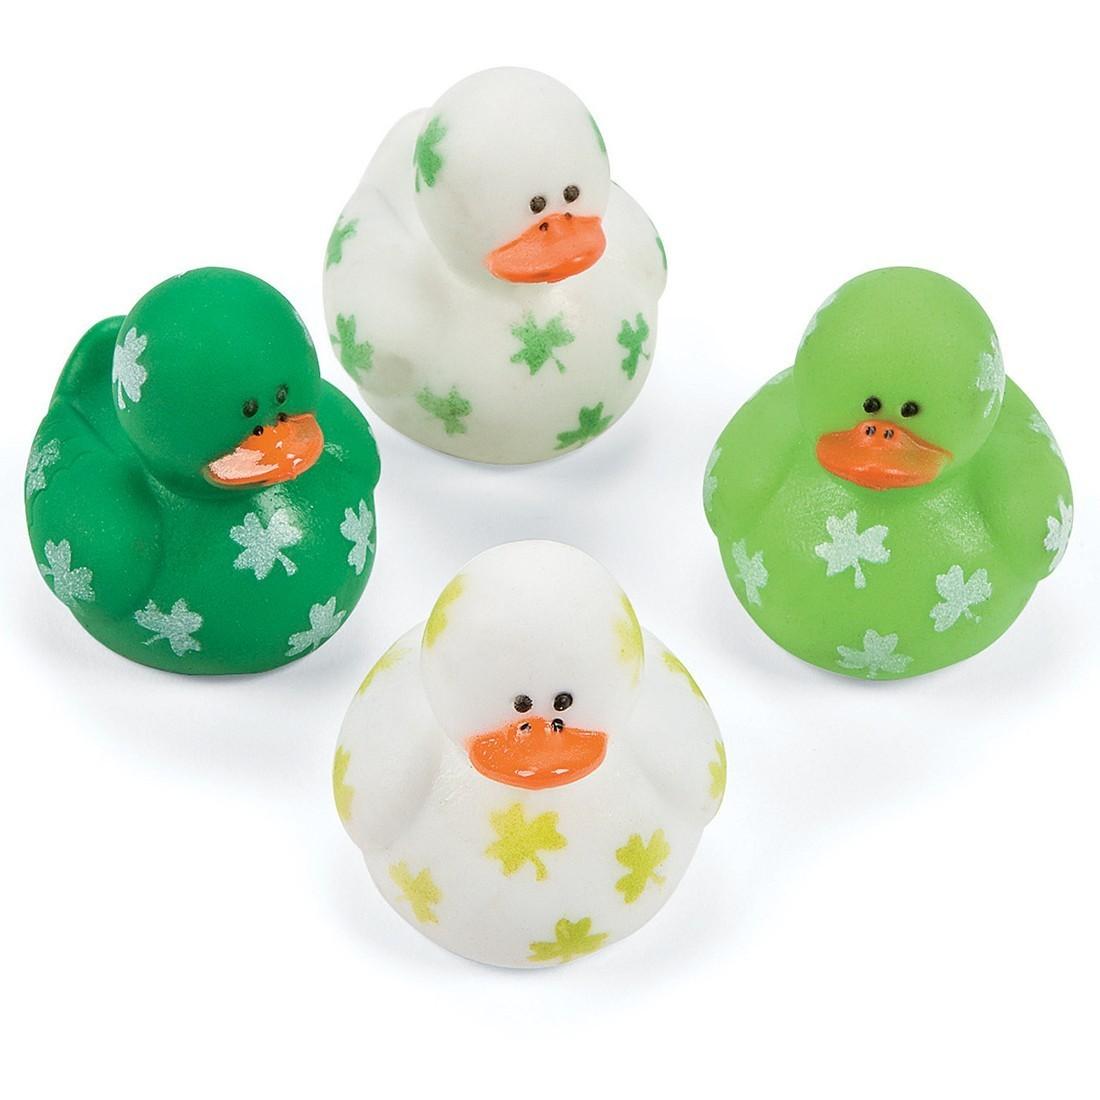 Shamrock Mini Rubber Ducks [image]